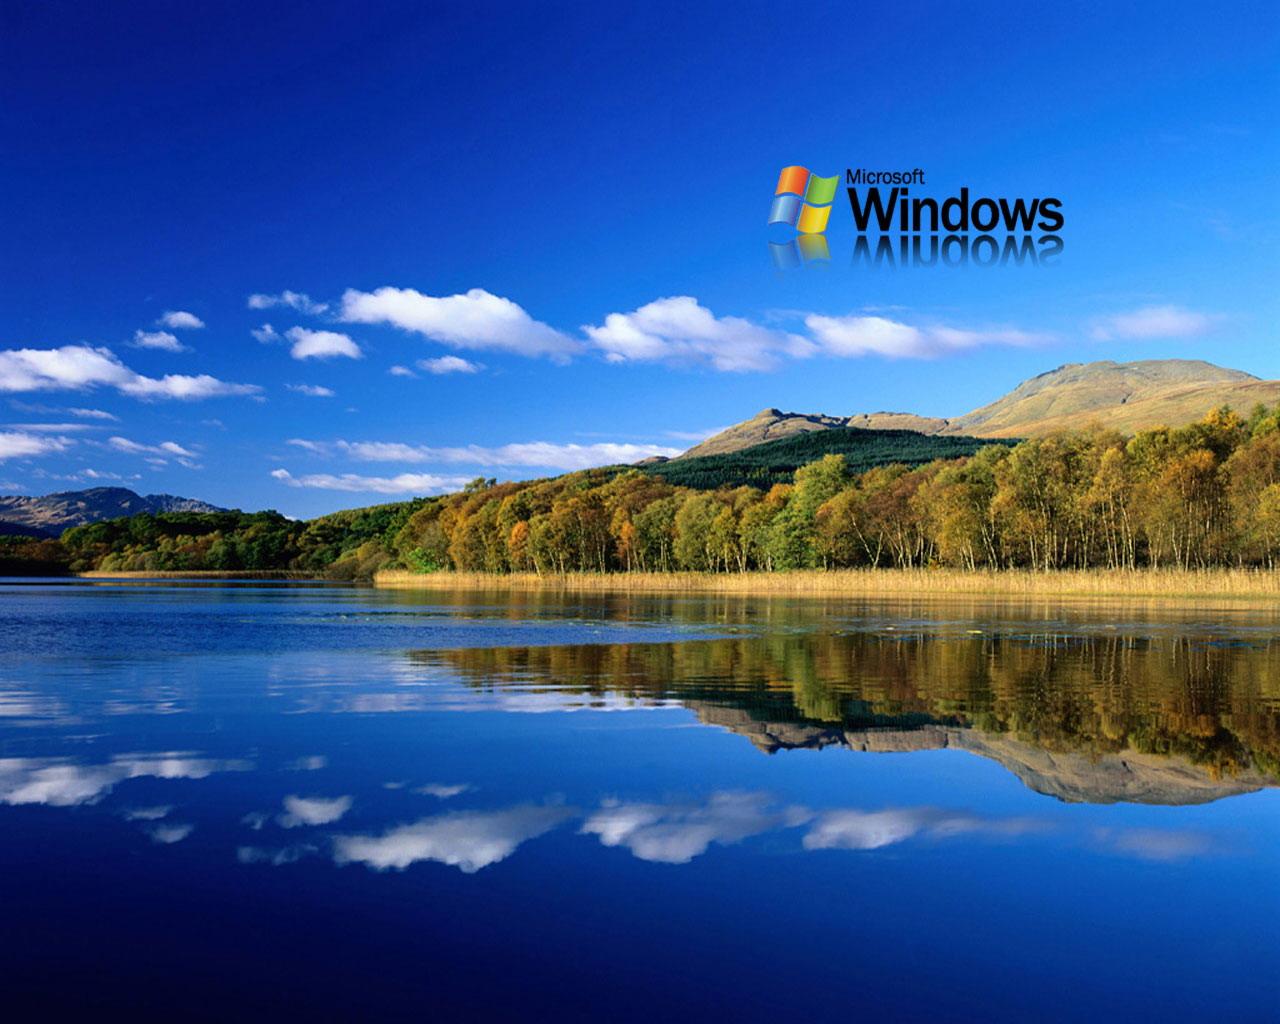 Windows Desktop Backgrounds Desktop Backgrounds 1280x1024